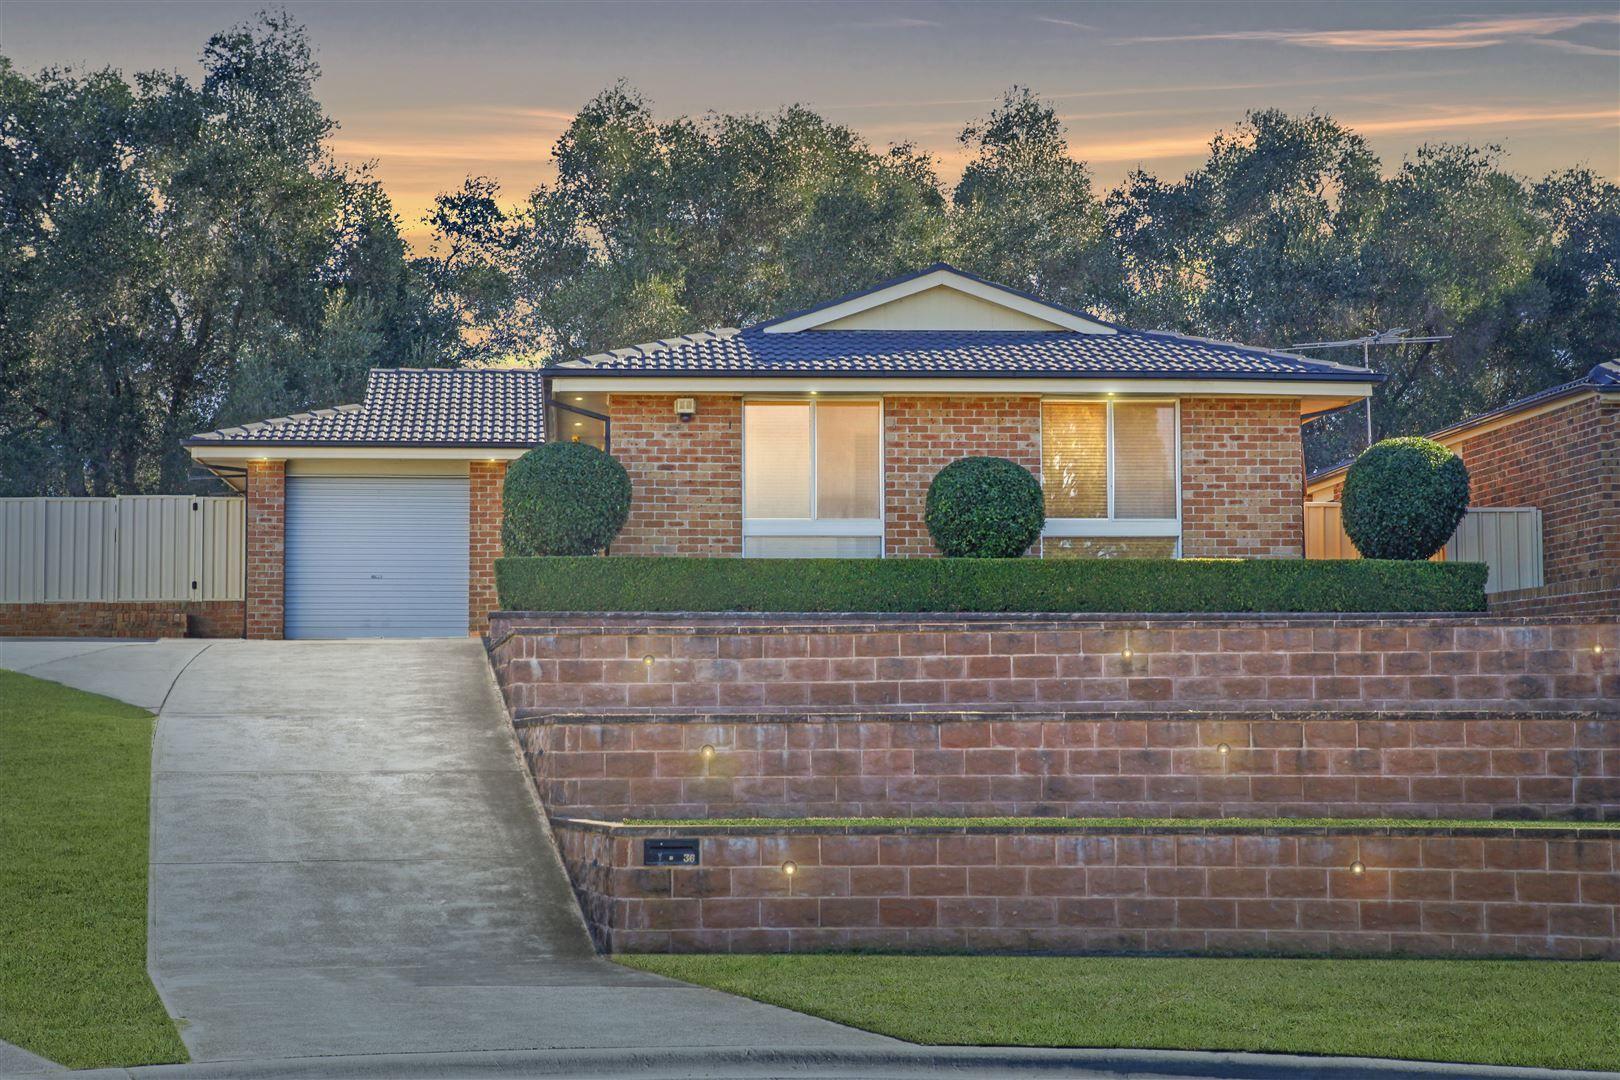 36 Traminer Place, Minchinbury NSW 2770, Image 0